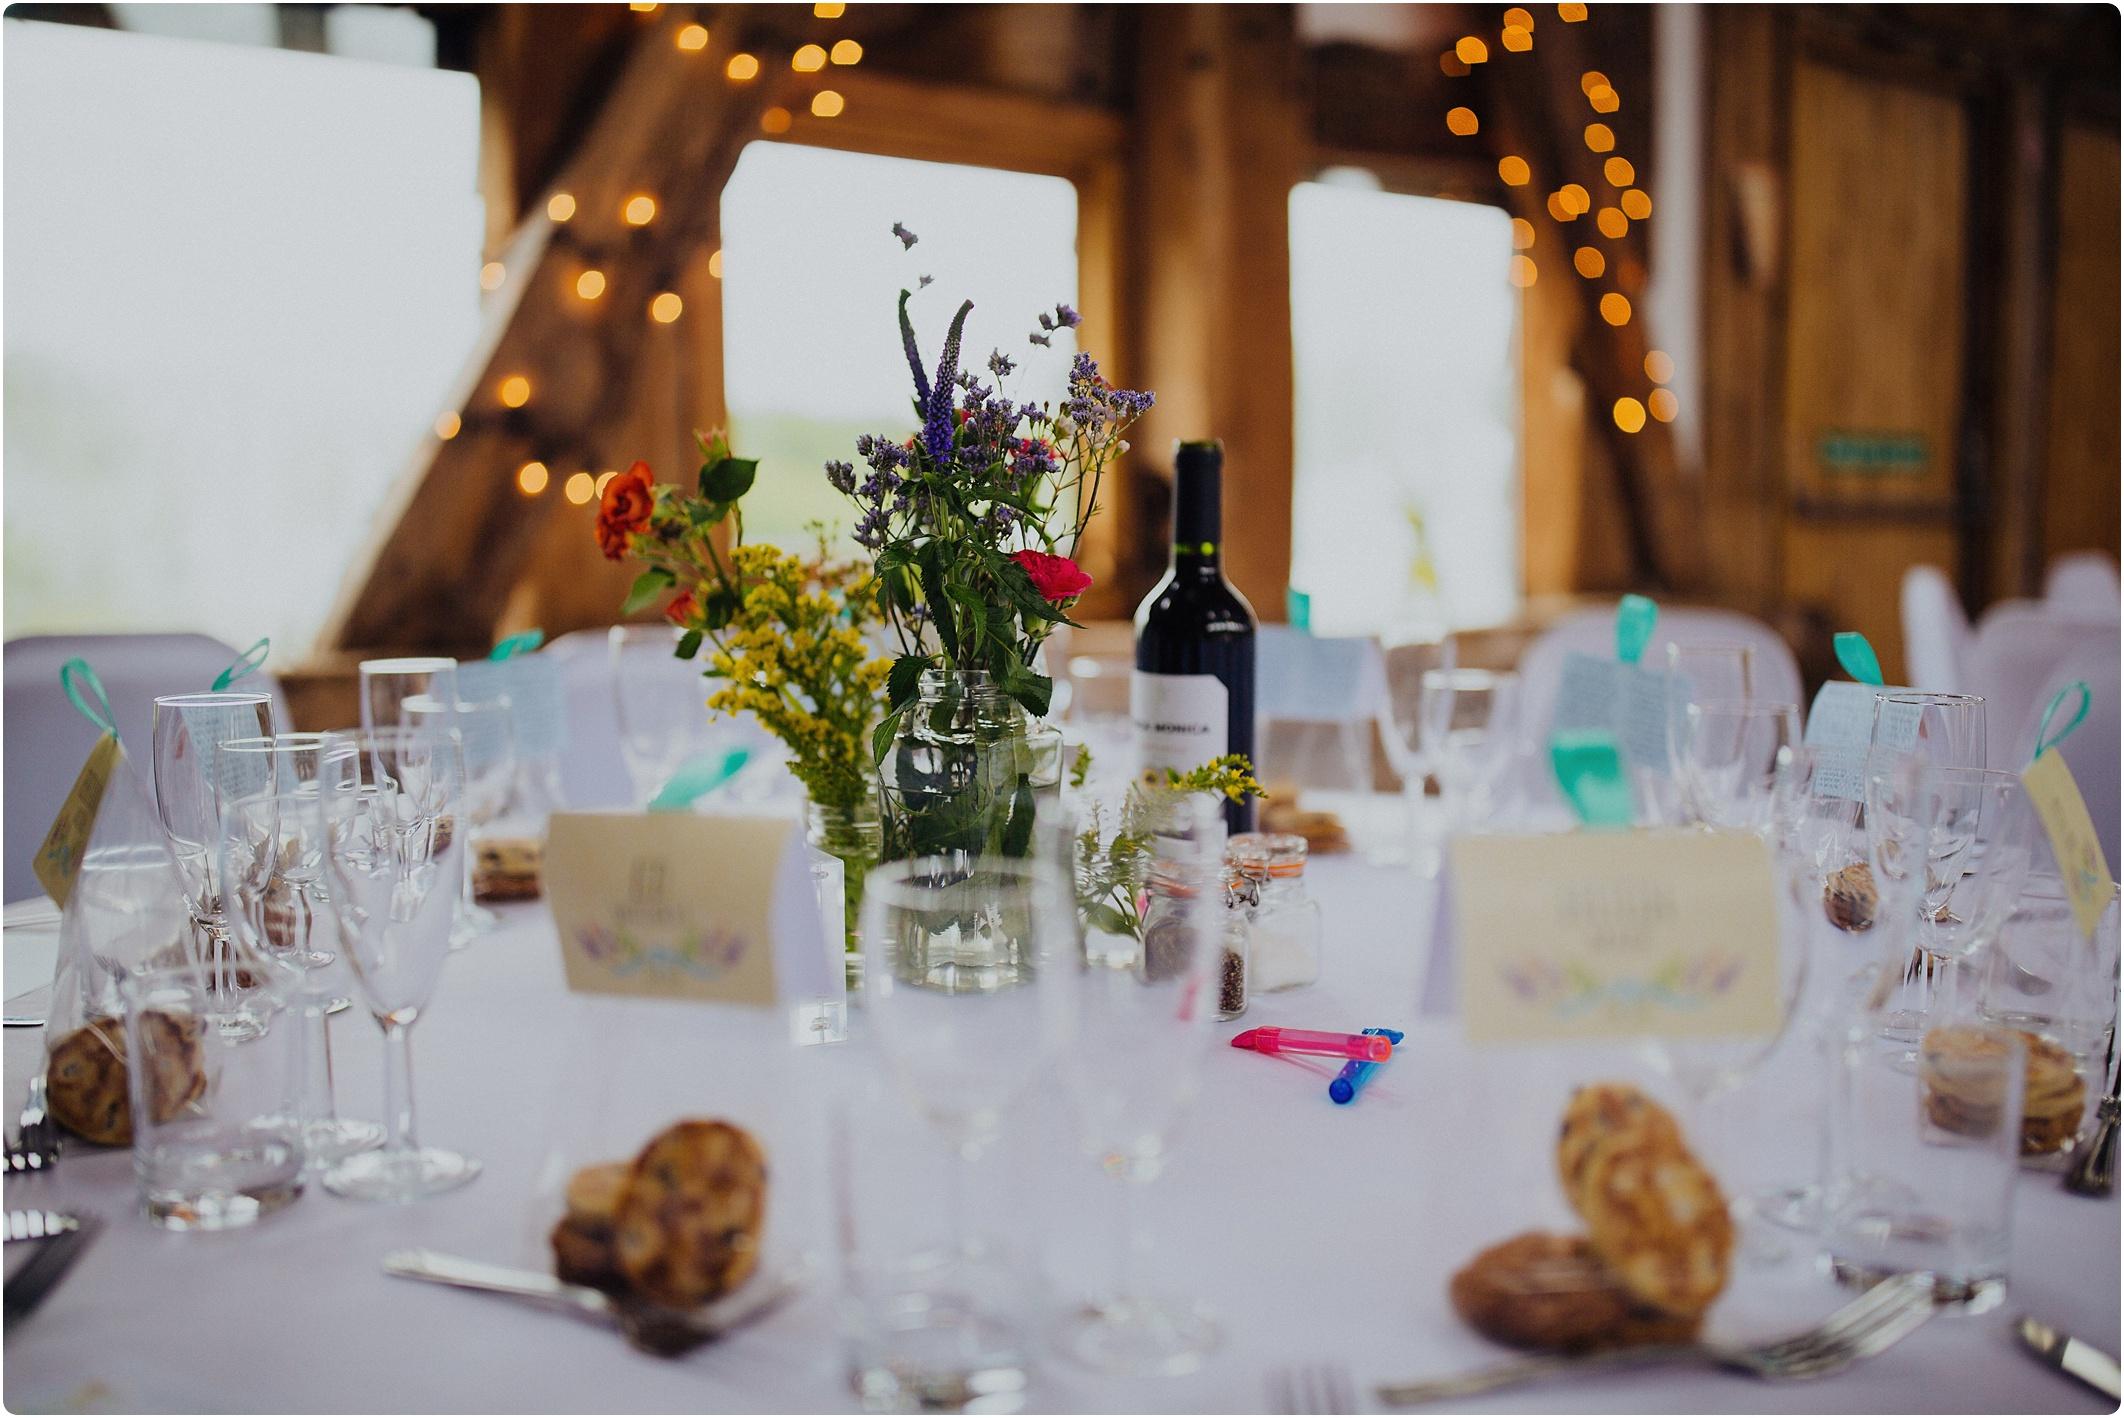 Treadam Barn Wedding table decoration